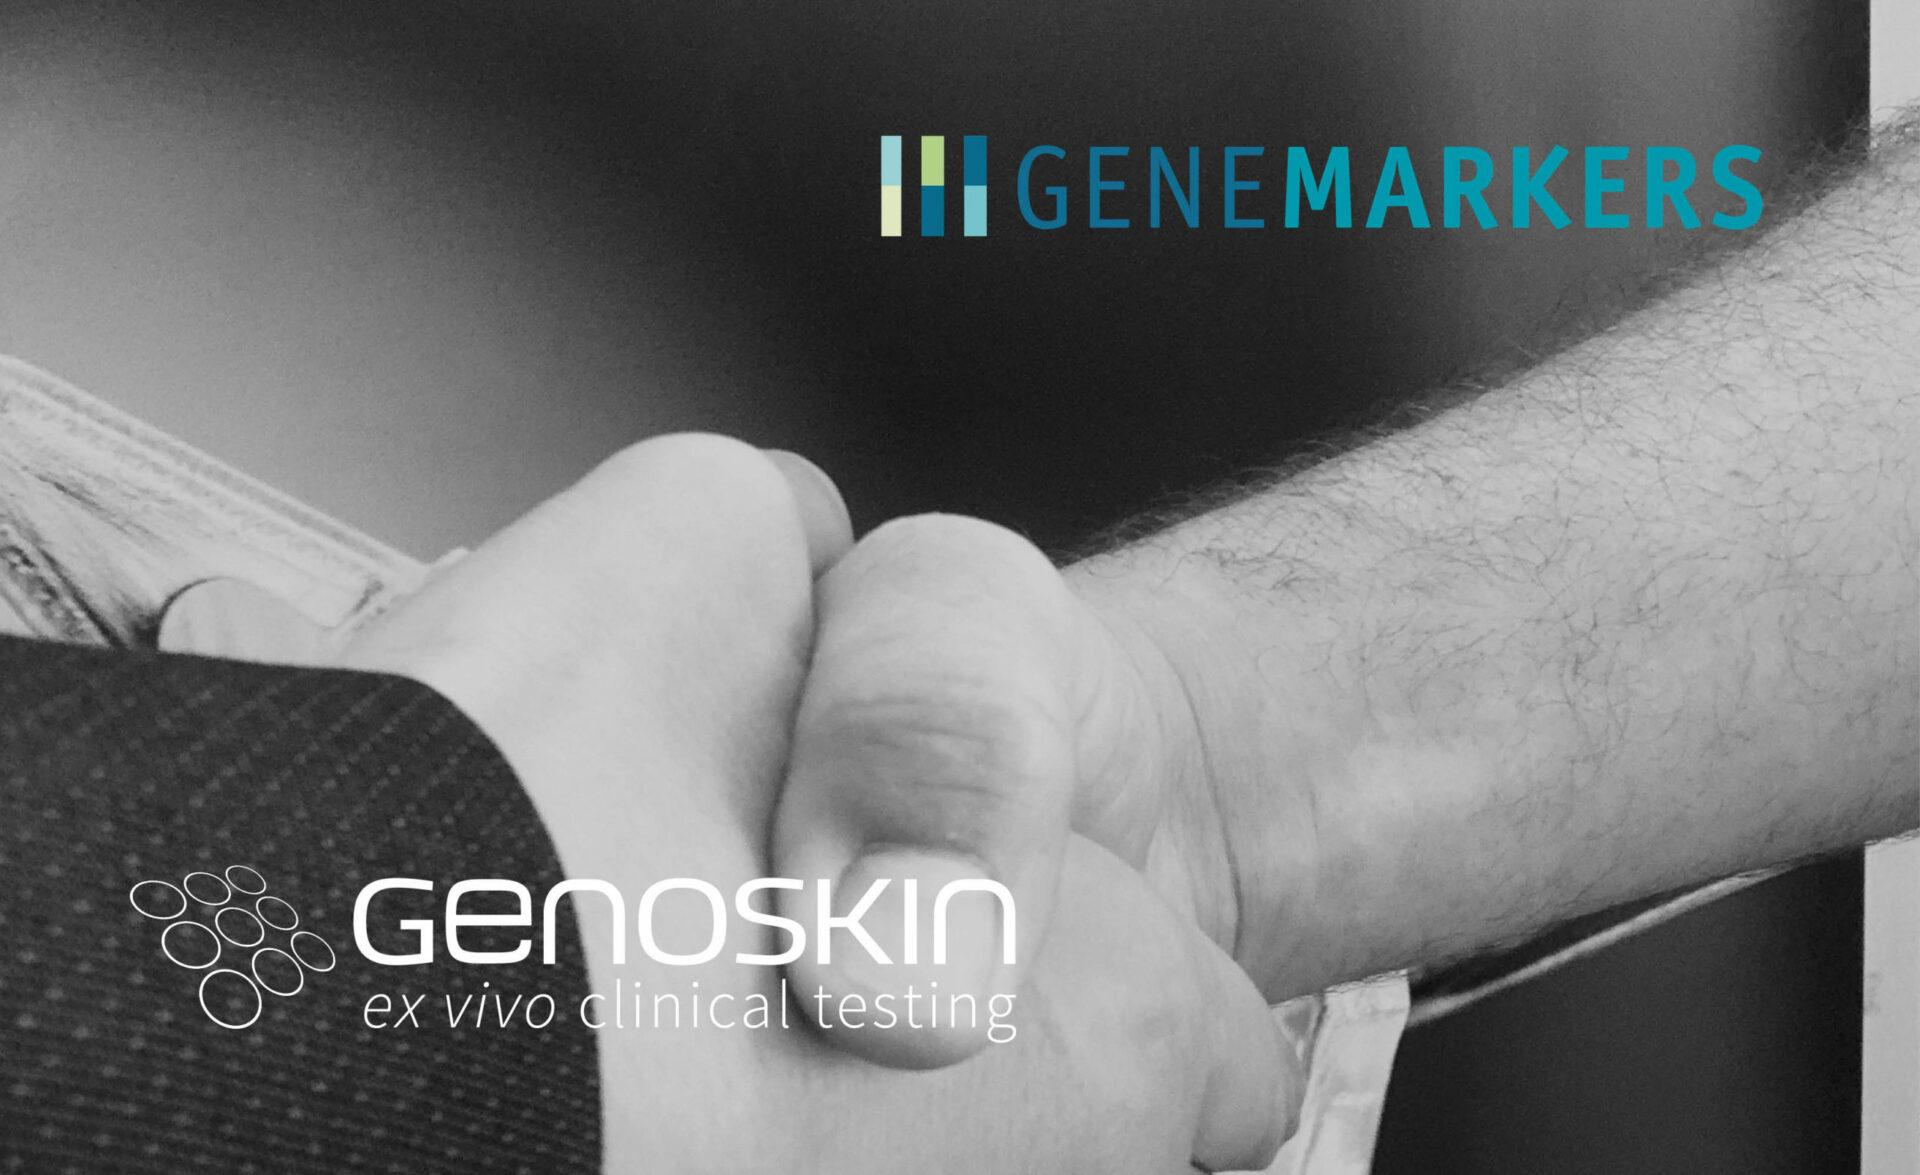 Two people shakings hands illustrating Genemarkers and Genoskin partnership